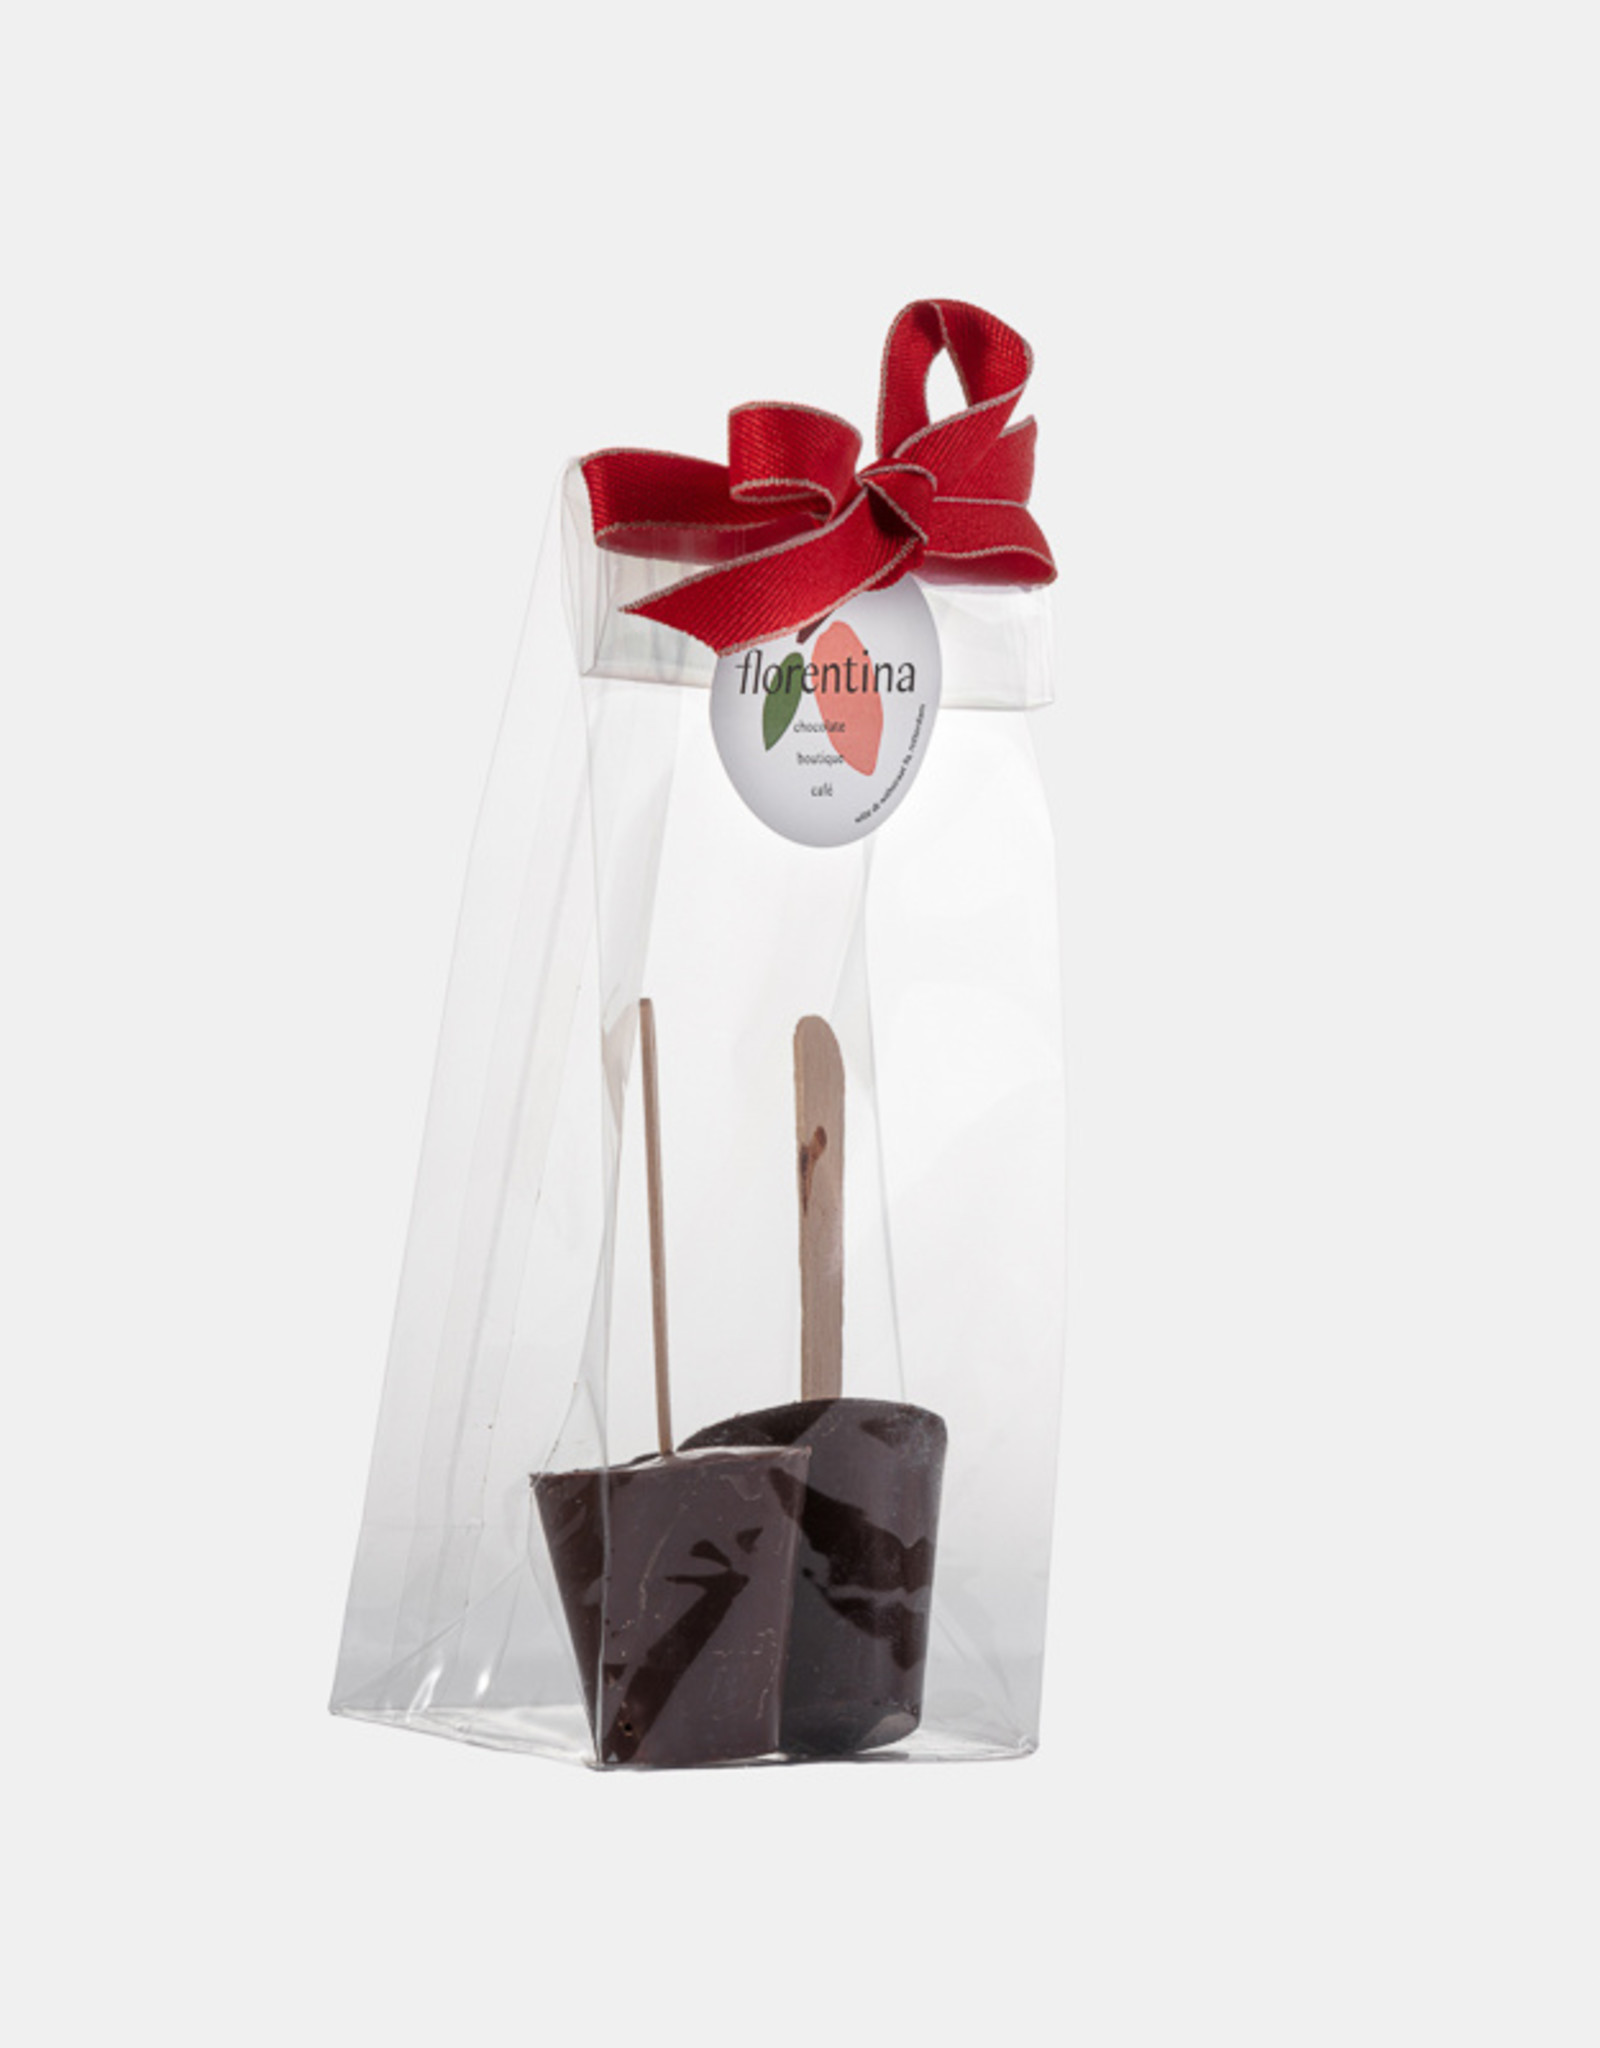 Florentina.Chocolates Florentina choco lepel